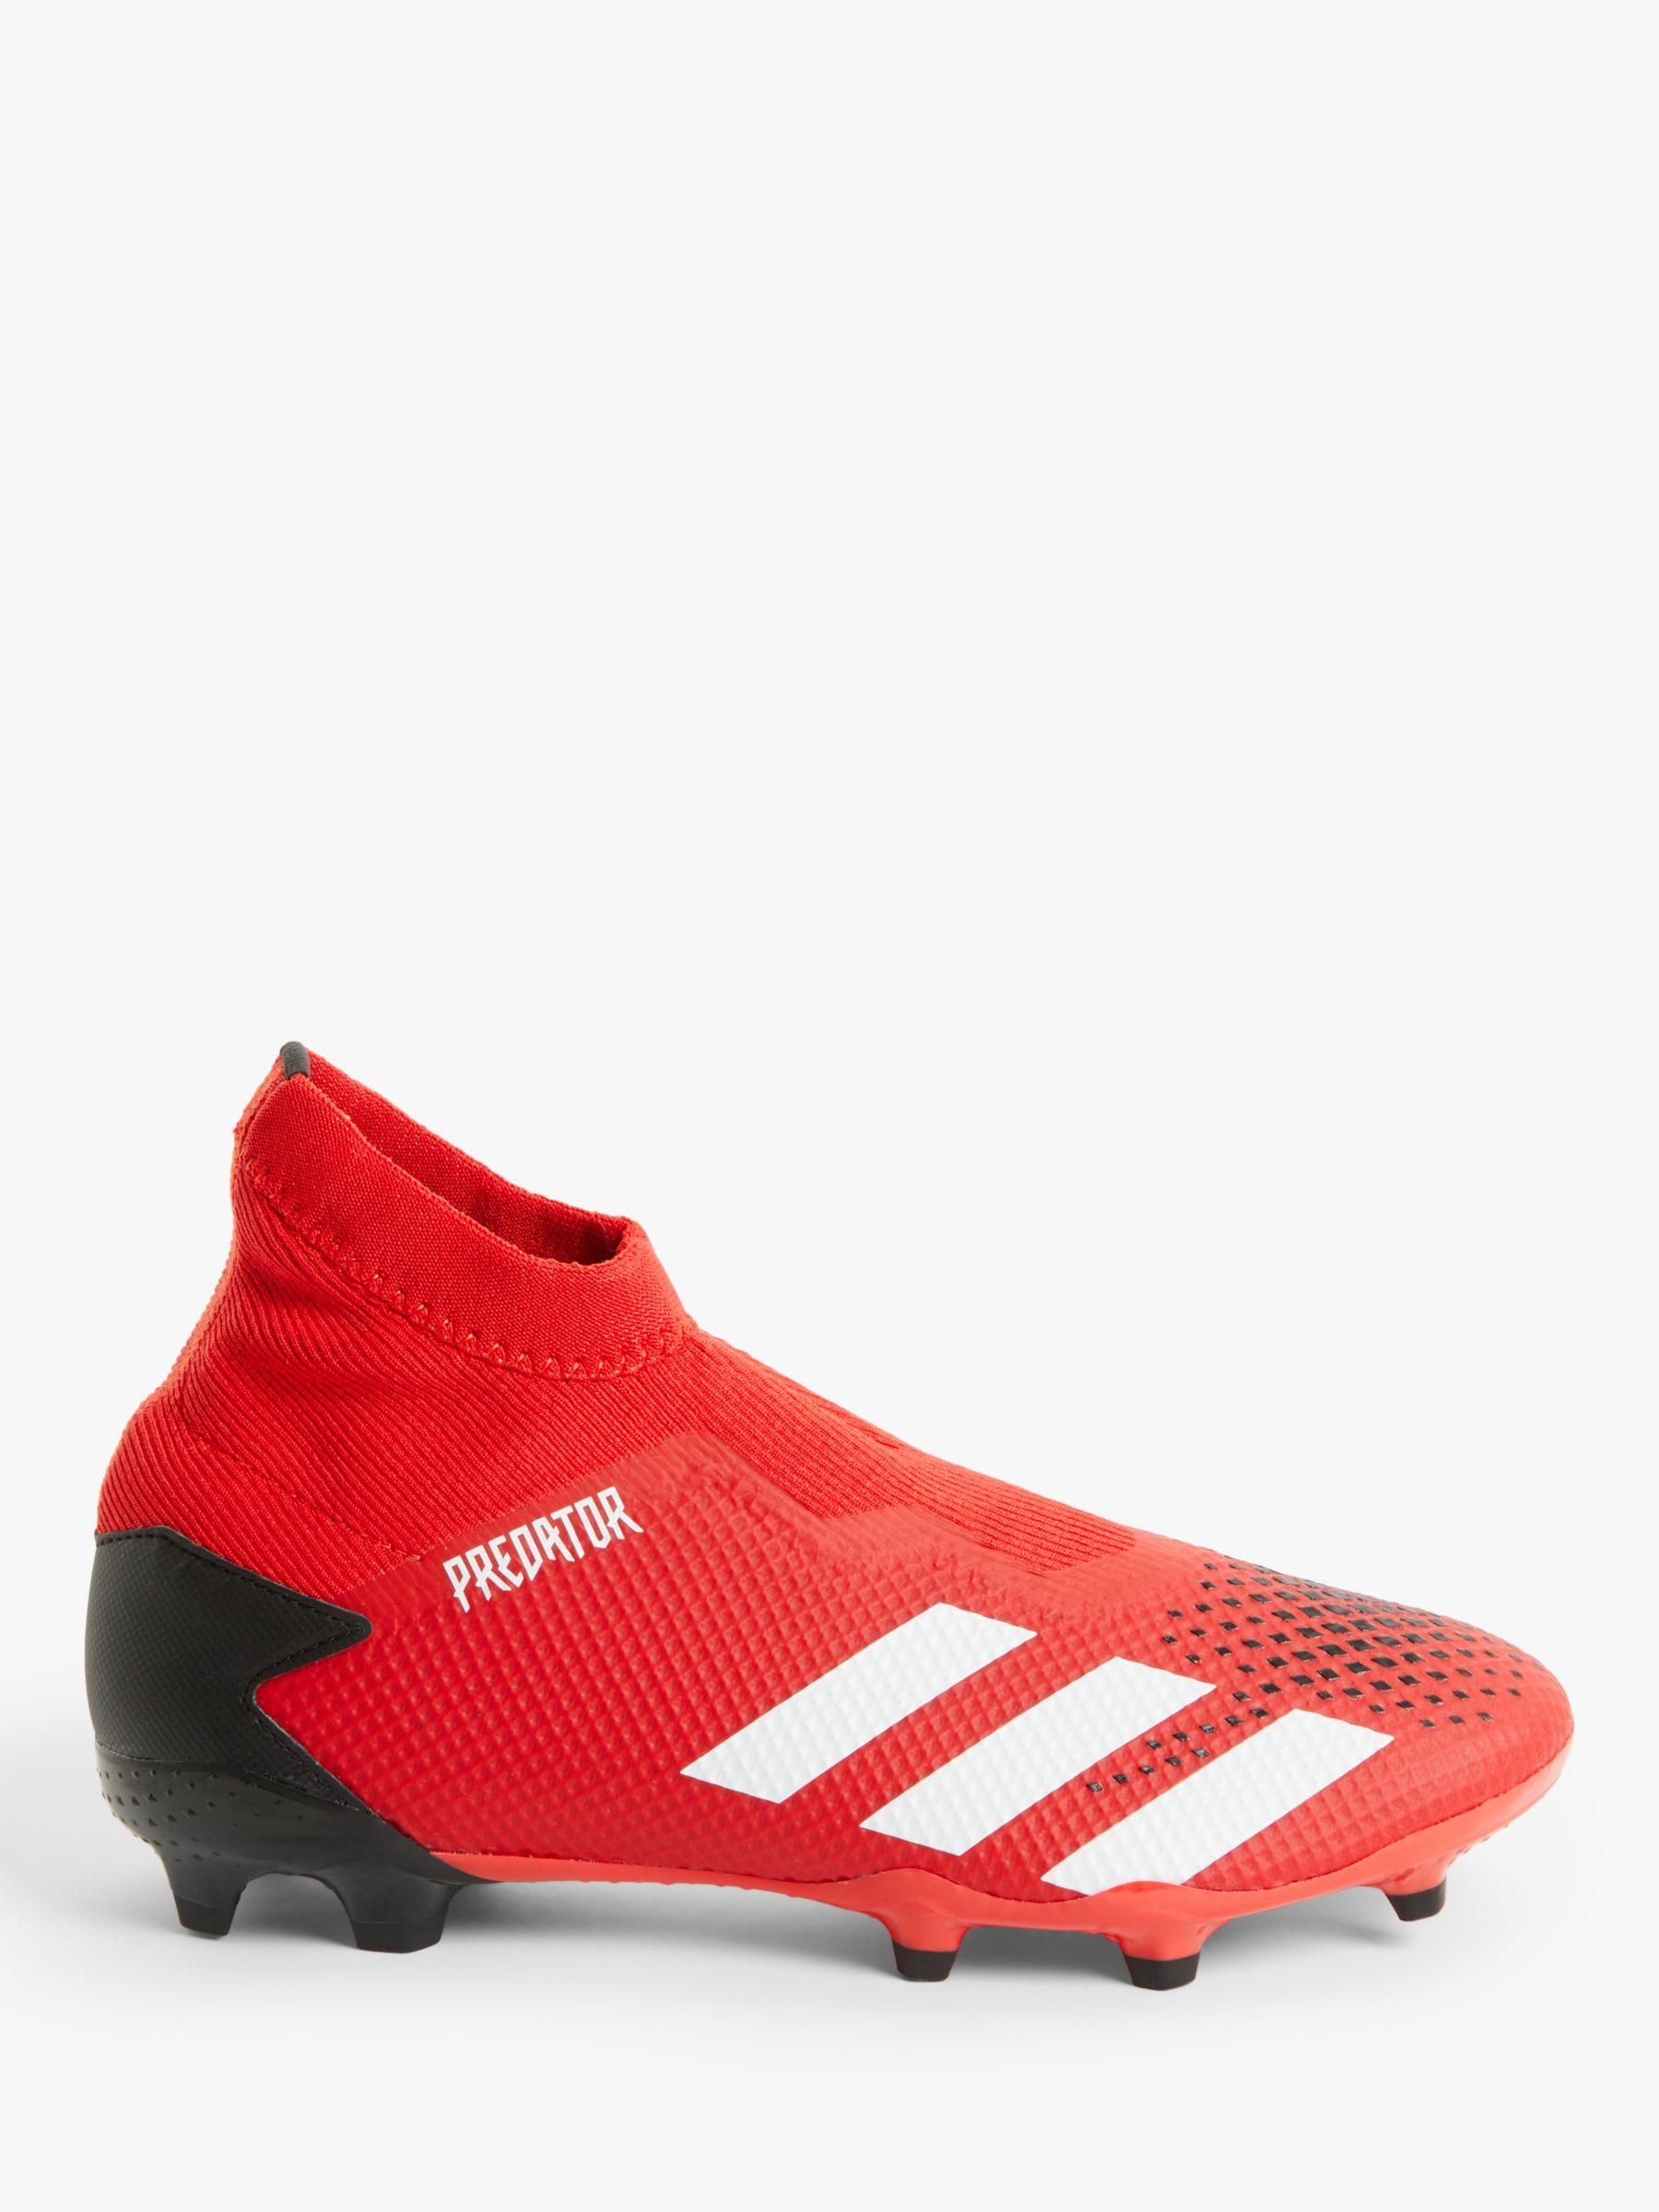 adidas Football Boots | Primeknit